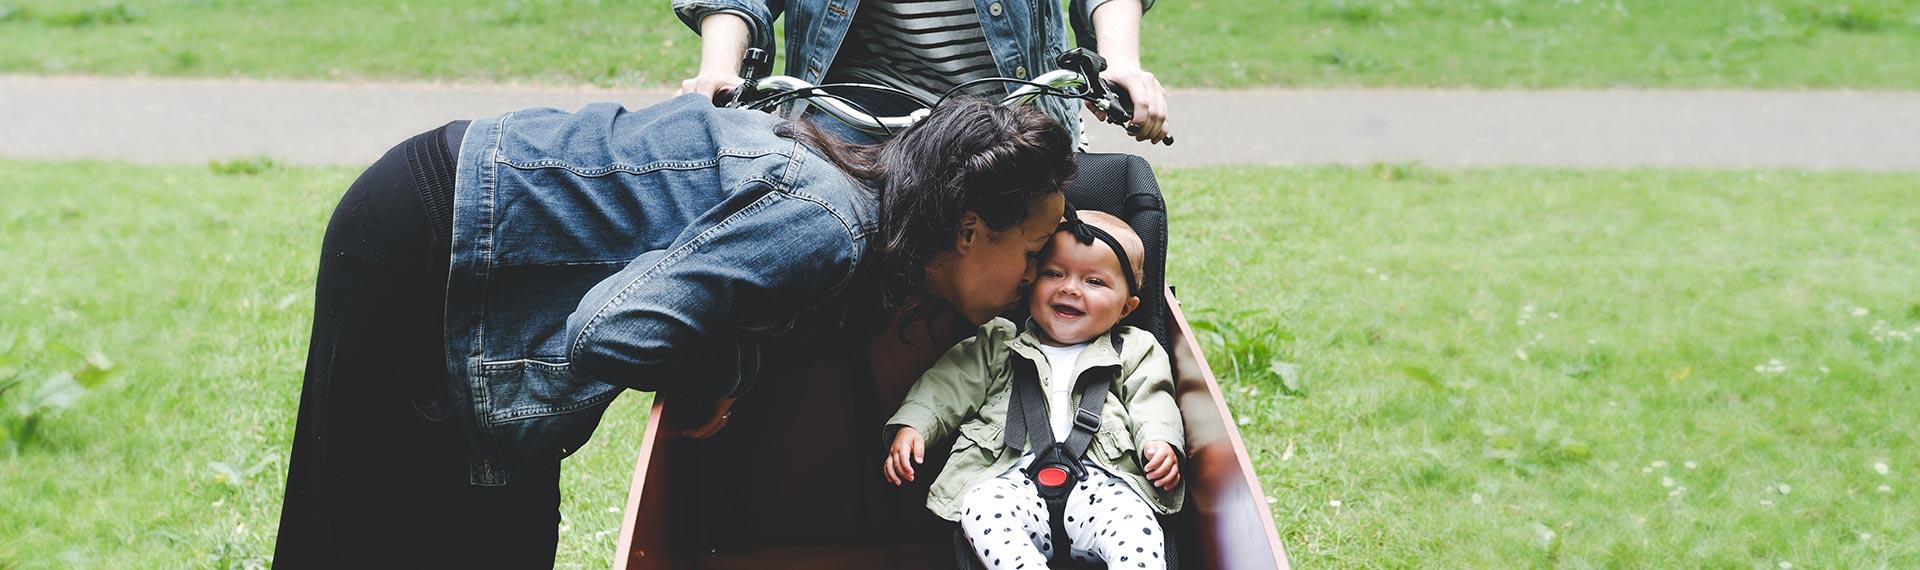 Baby & child seats